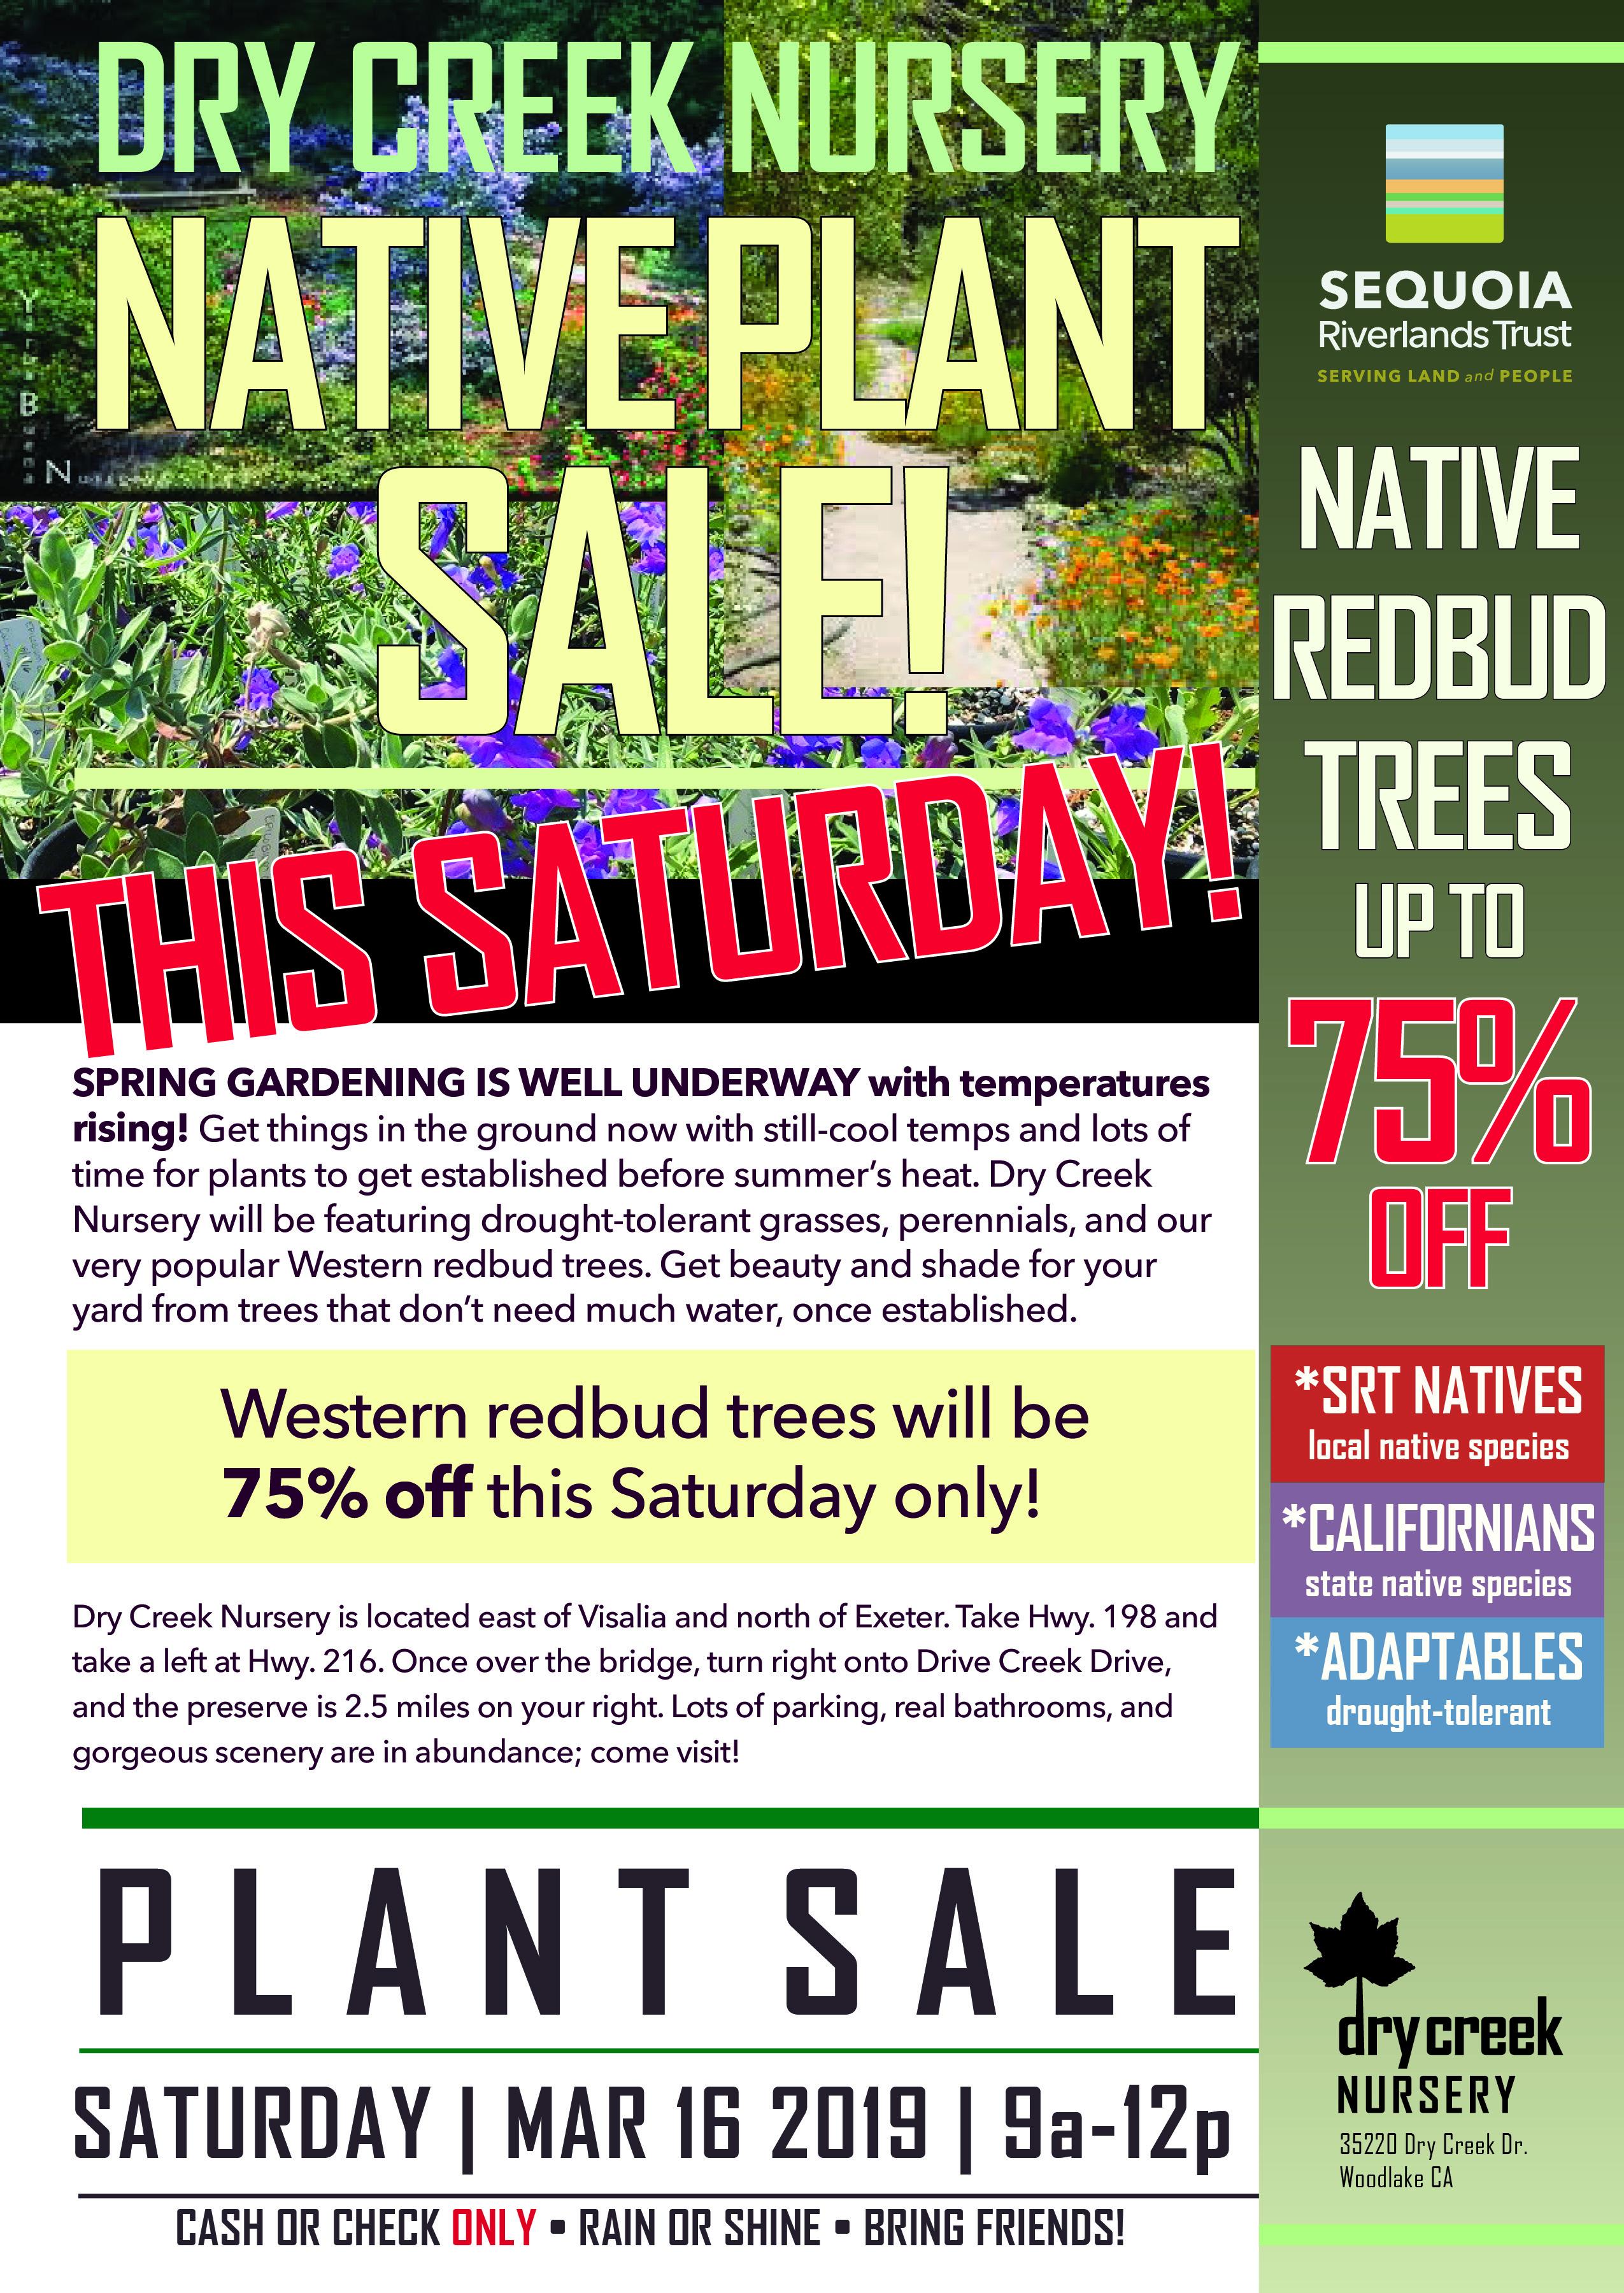 SRT Dry Creek Nursery NATIVE PLANT SALE this Saturday!